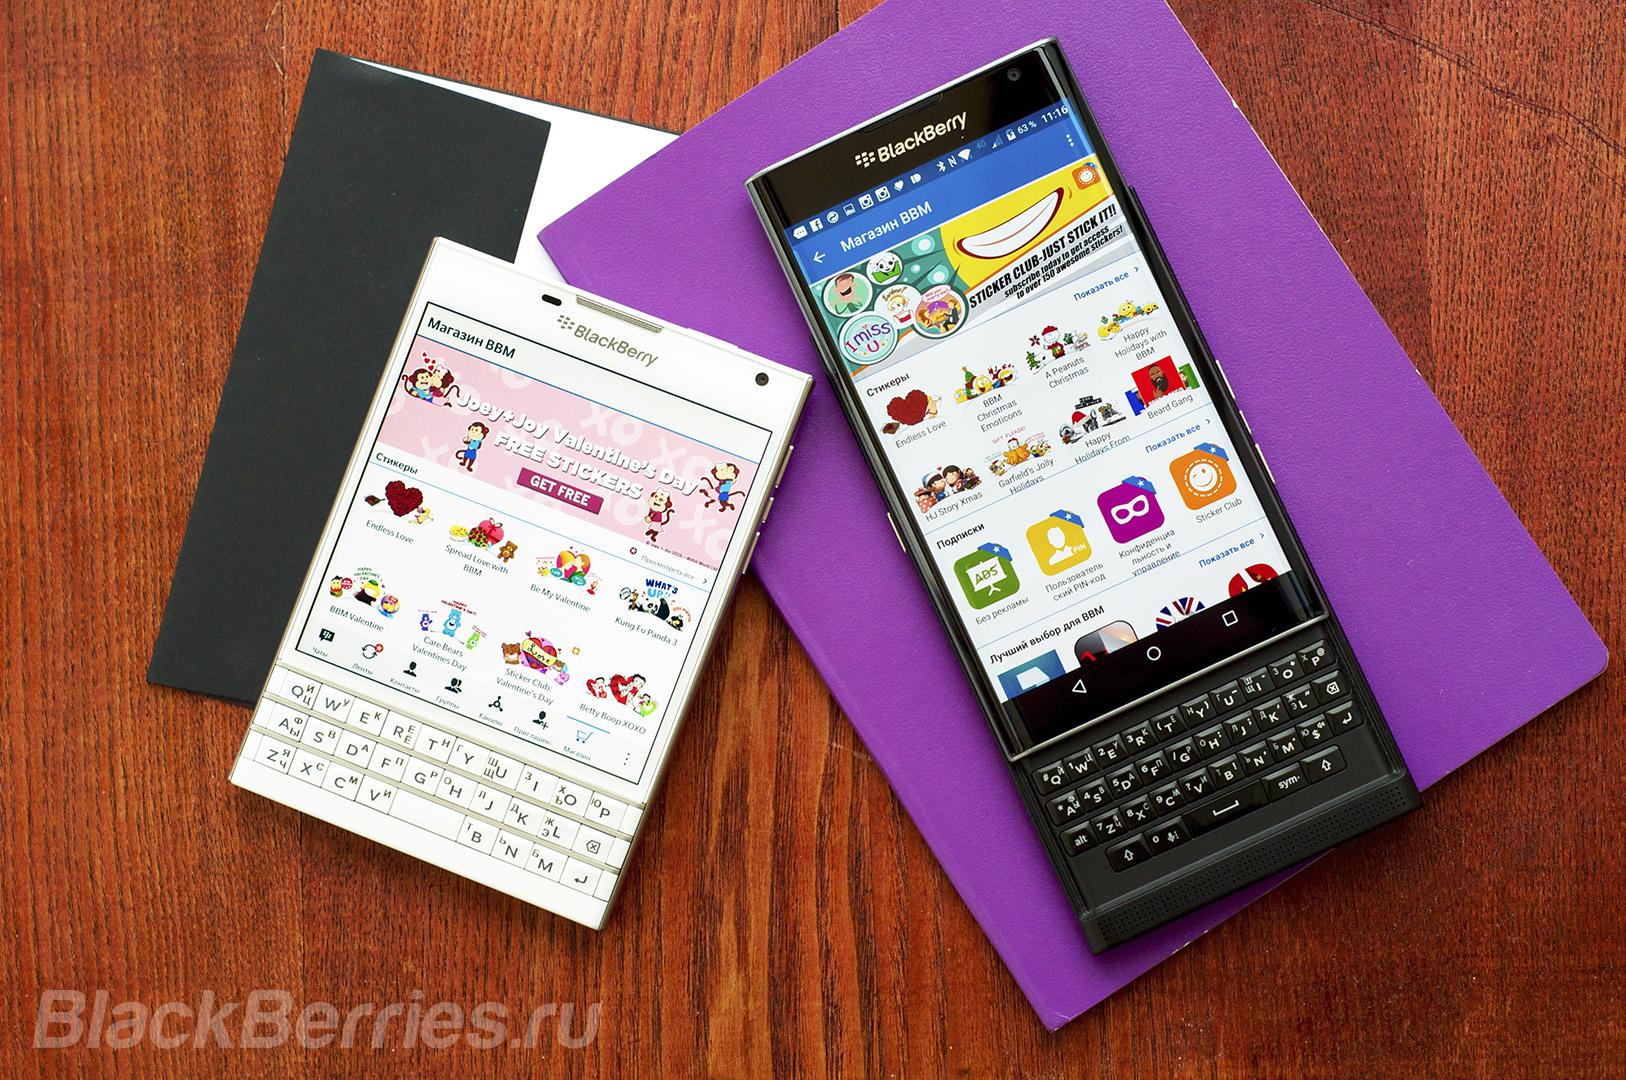 BlackBerry-BBM-Stickers